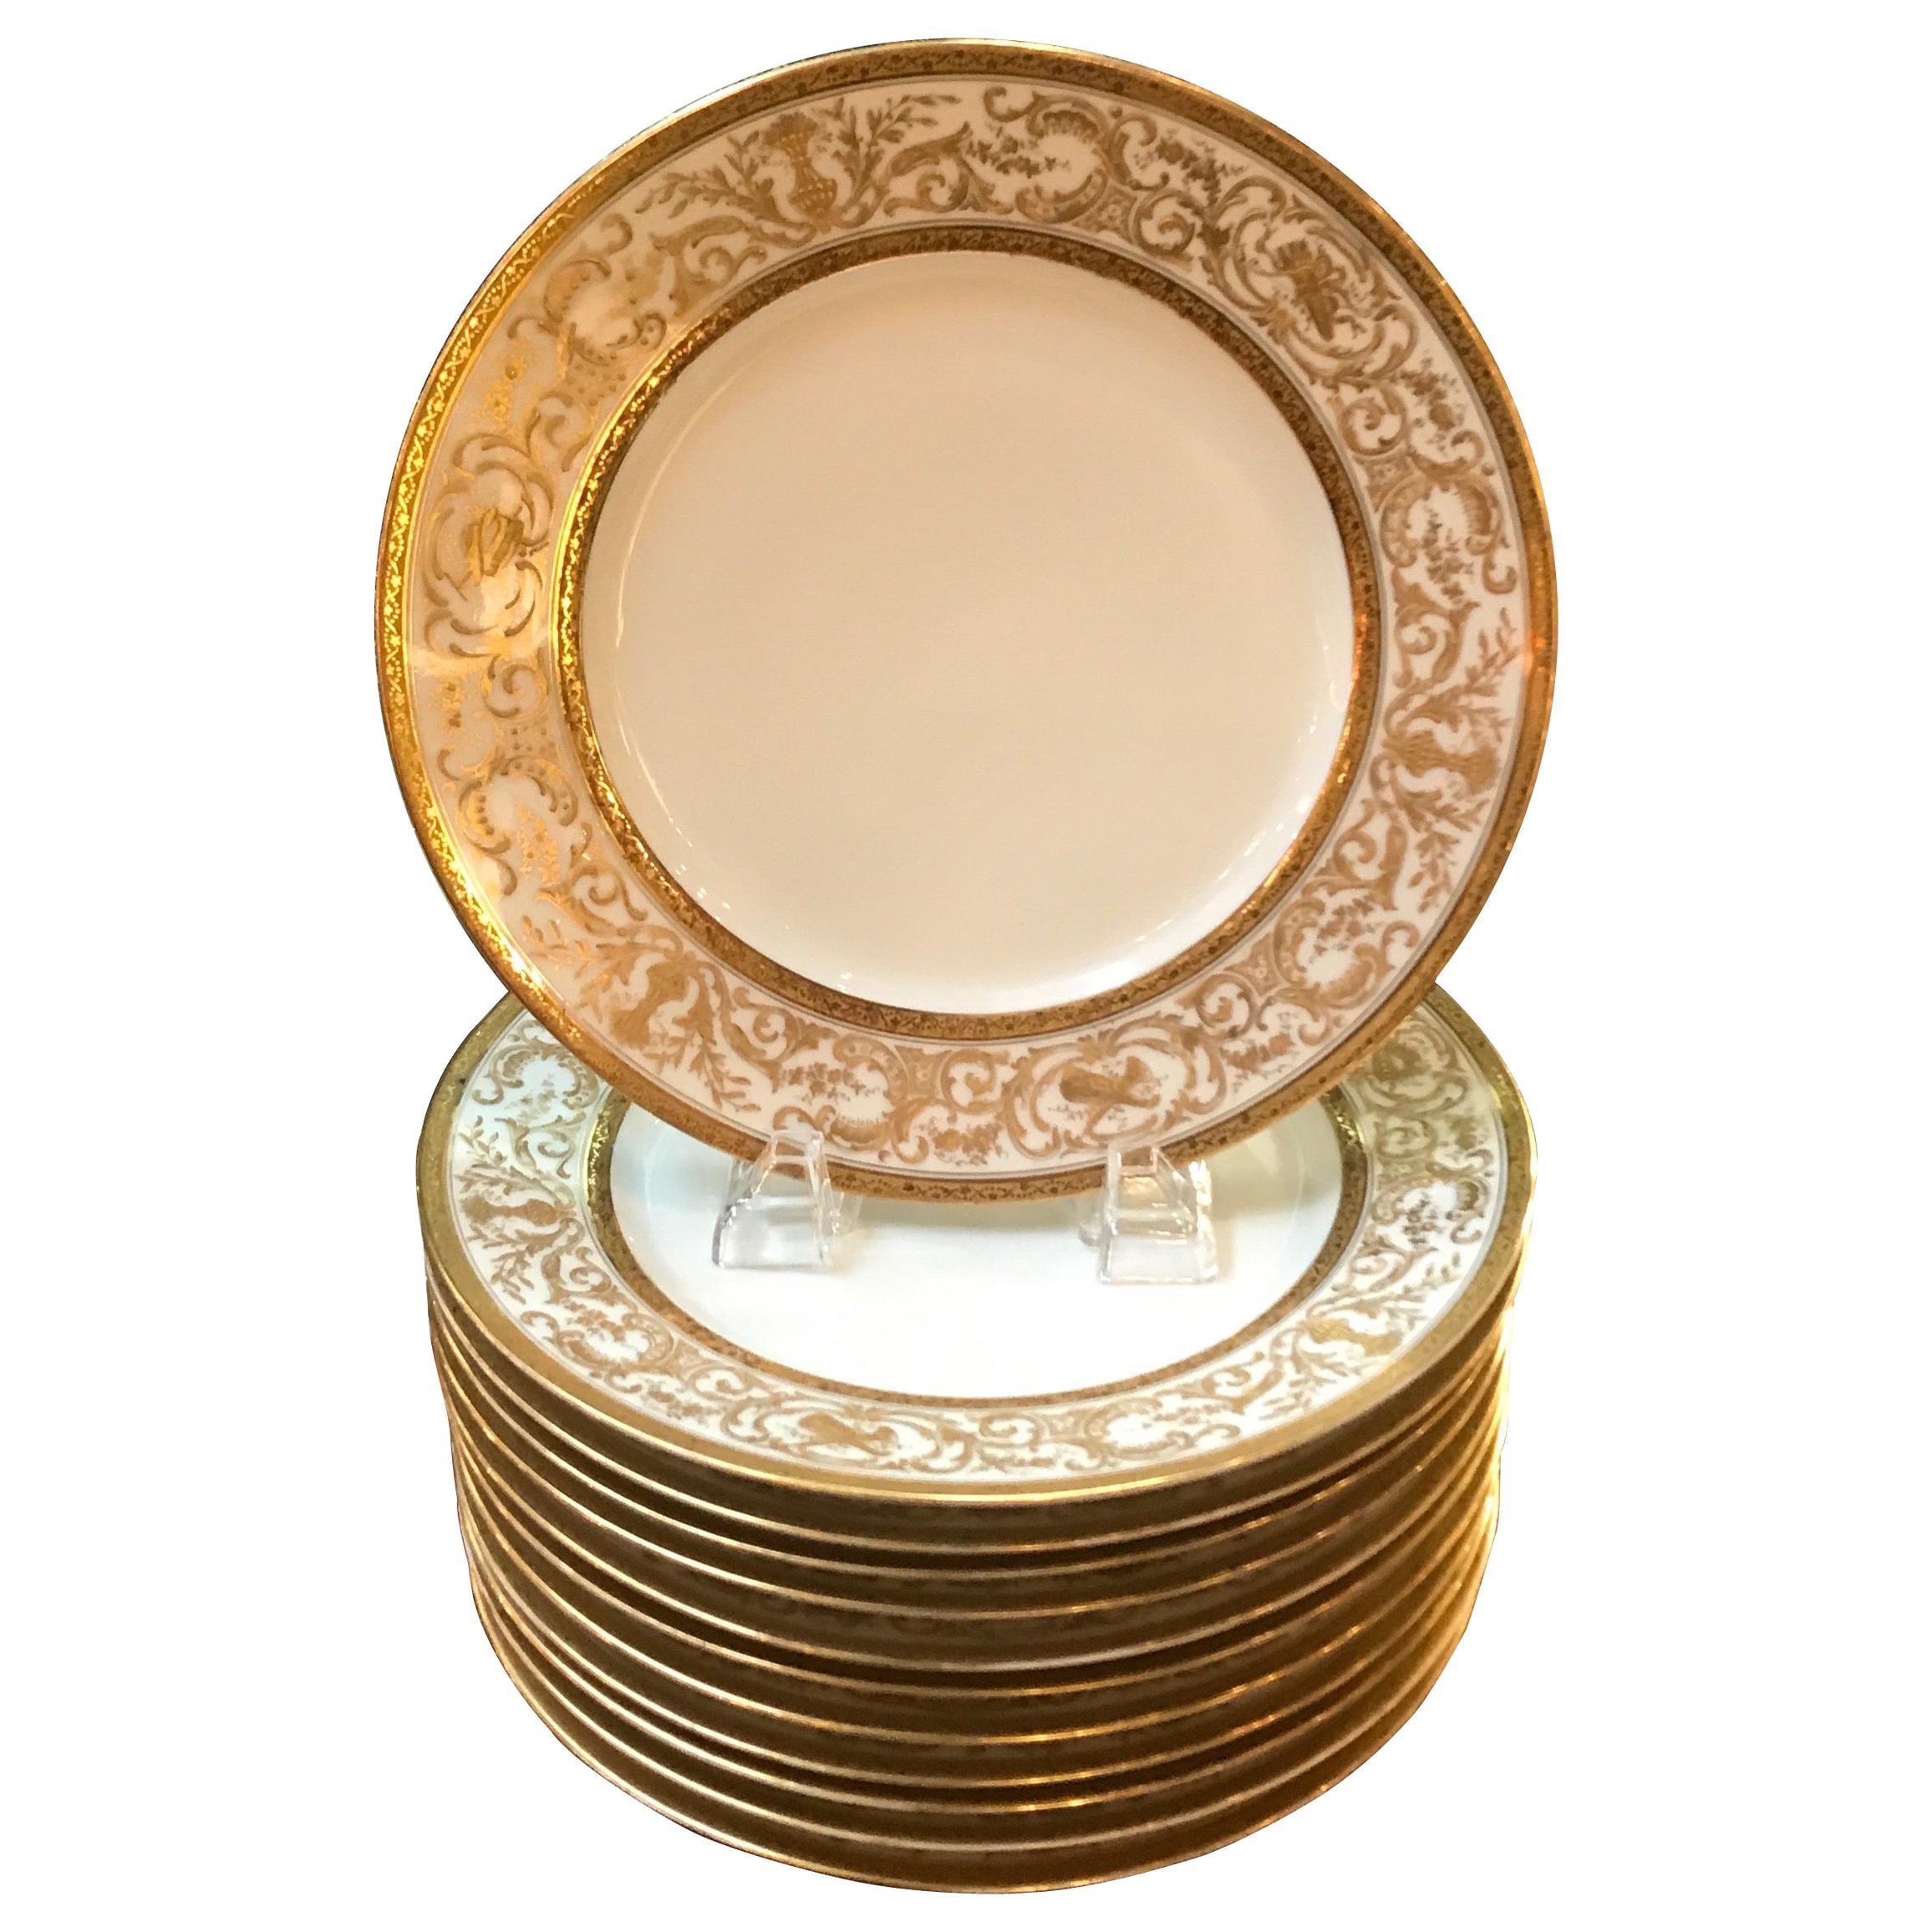 Set of 12 French Antique Raised Gilt Plates, circa 1900